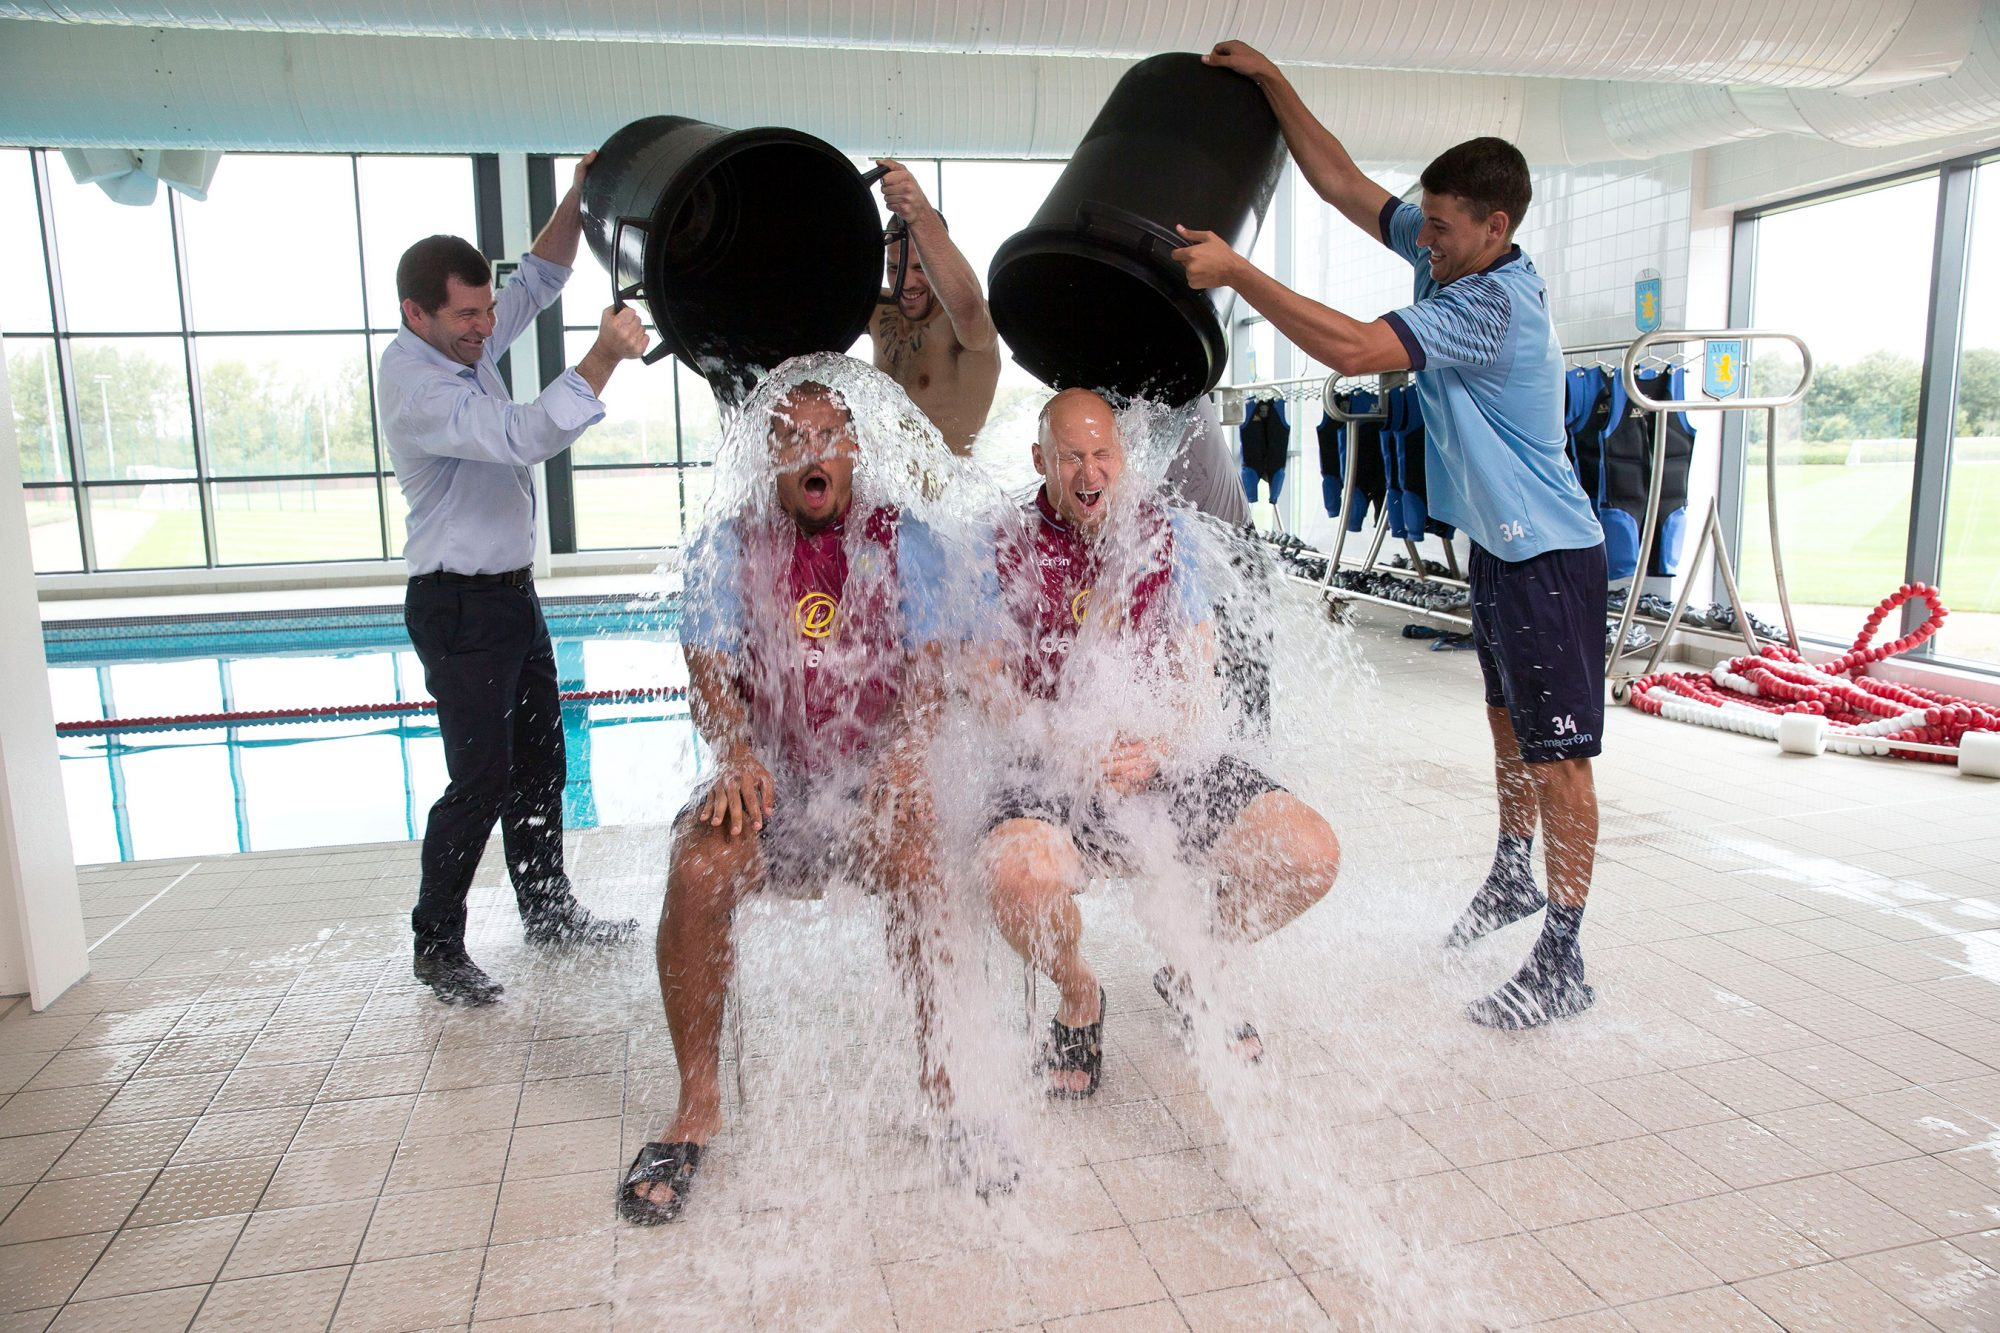 Gabriel Agbonlahor and Brad Guzan Take Part in the Ice Bucket Challenge